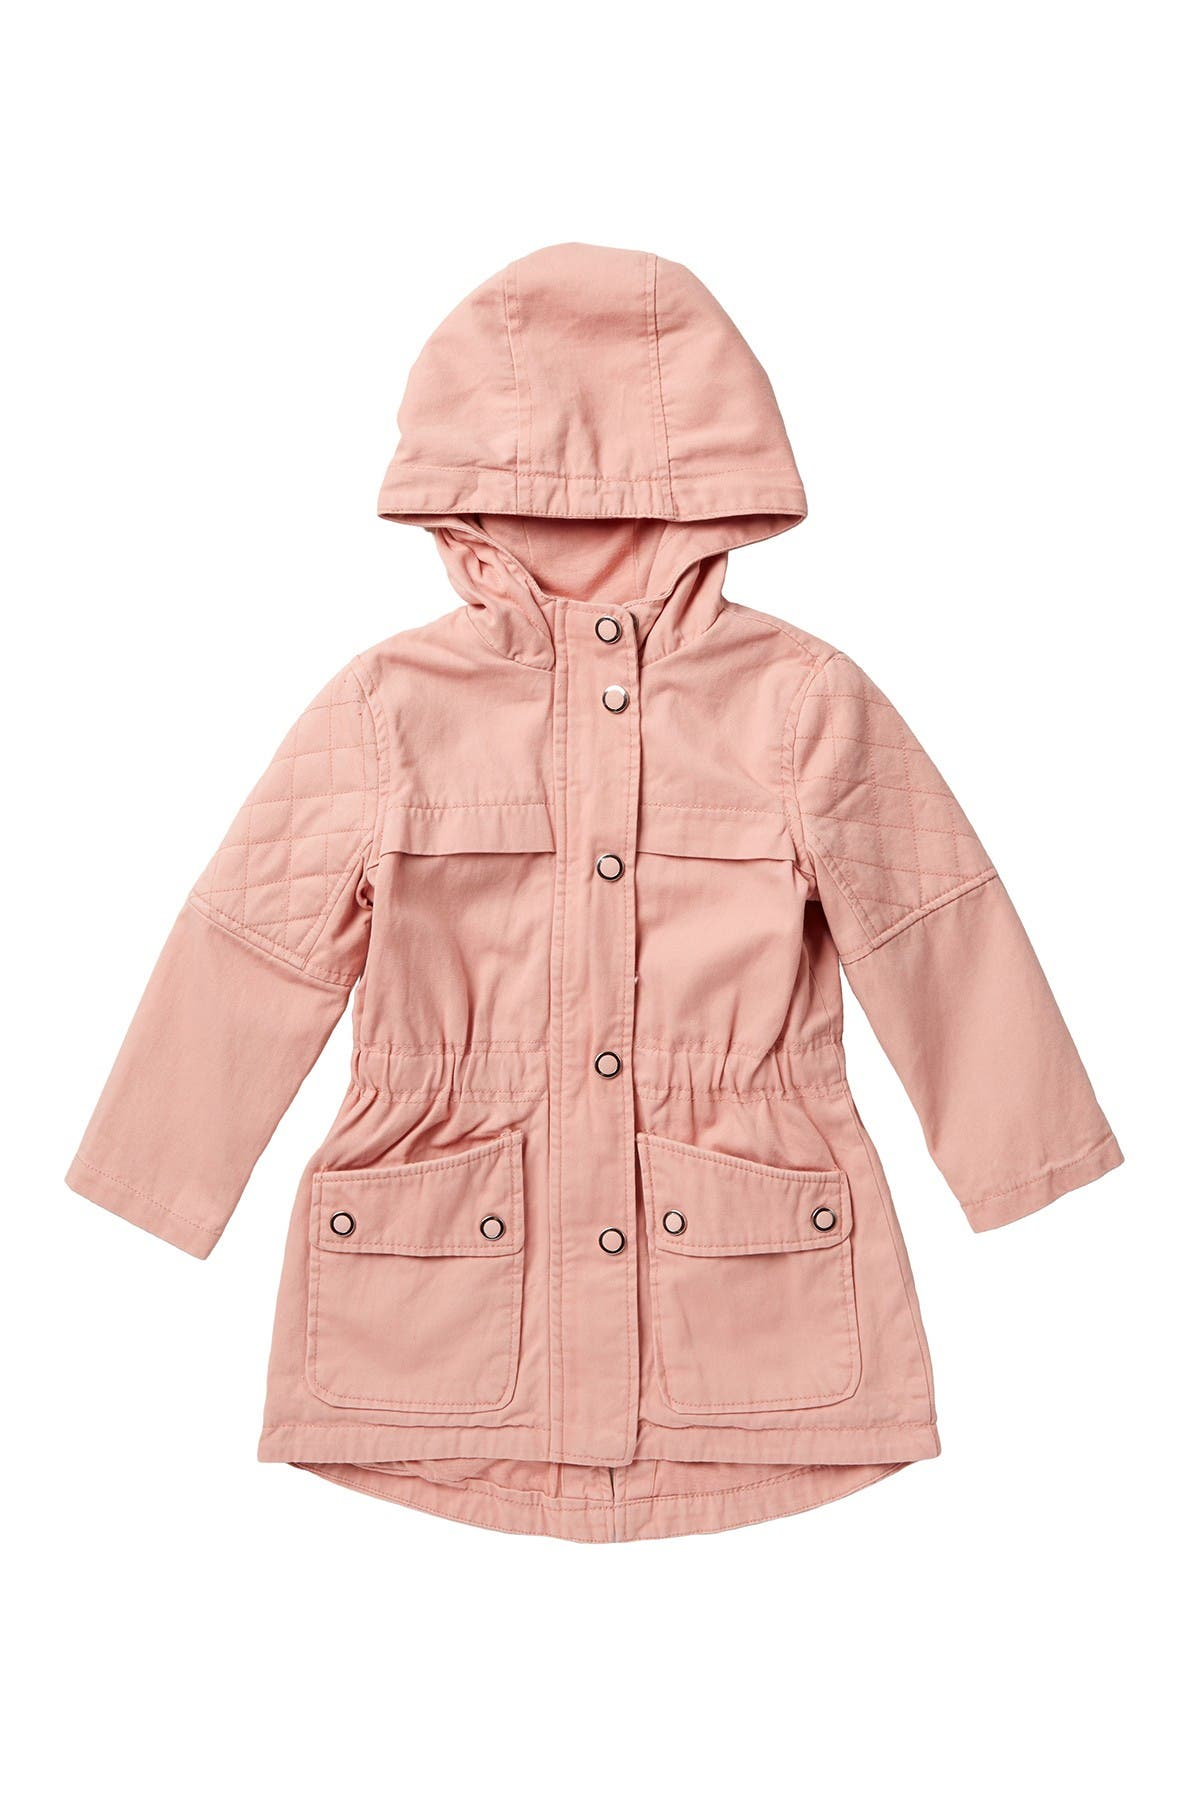 URBAN REPUBLIC girls Girls Cttn Woven Jacket